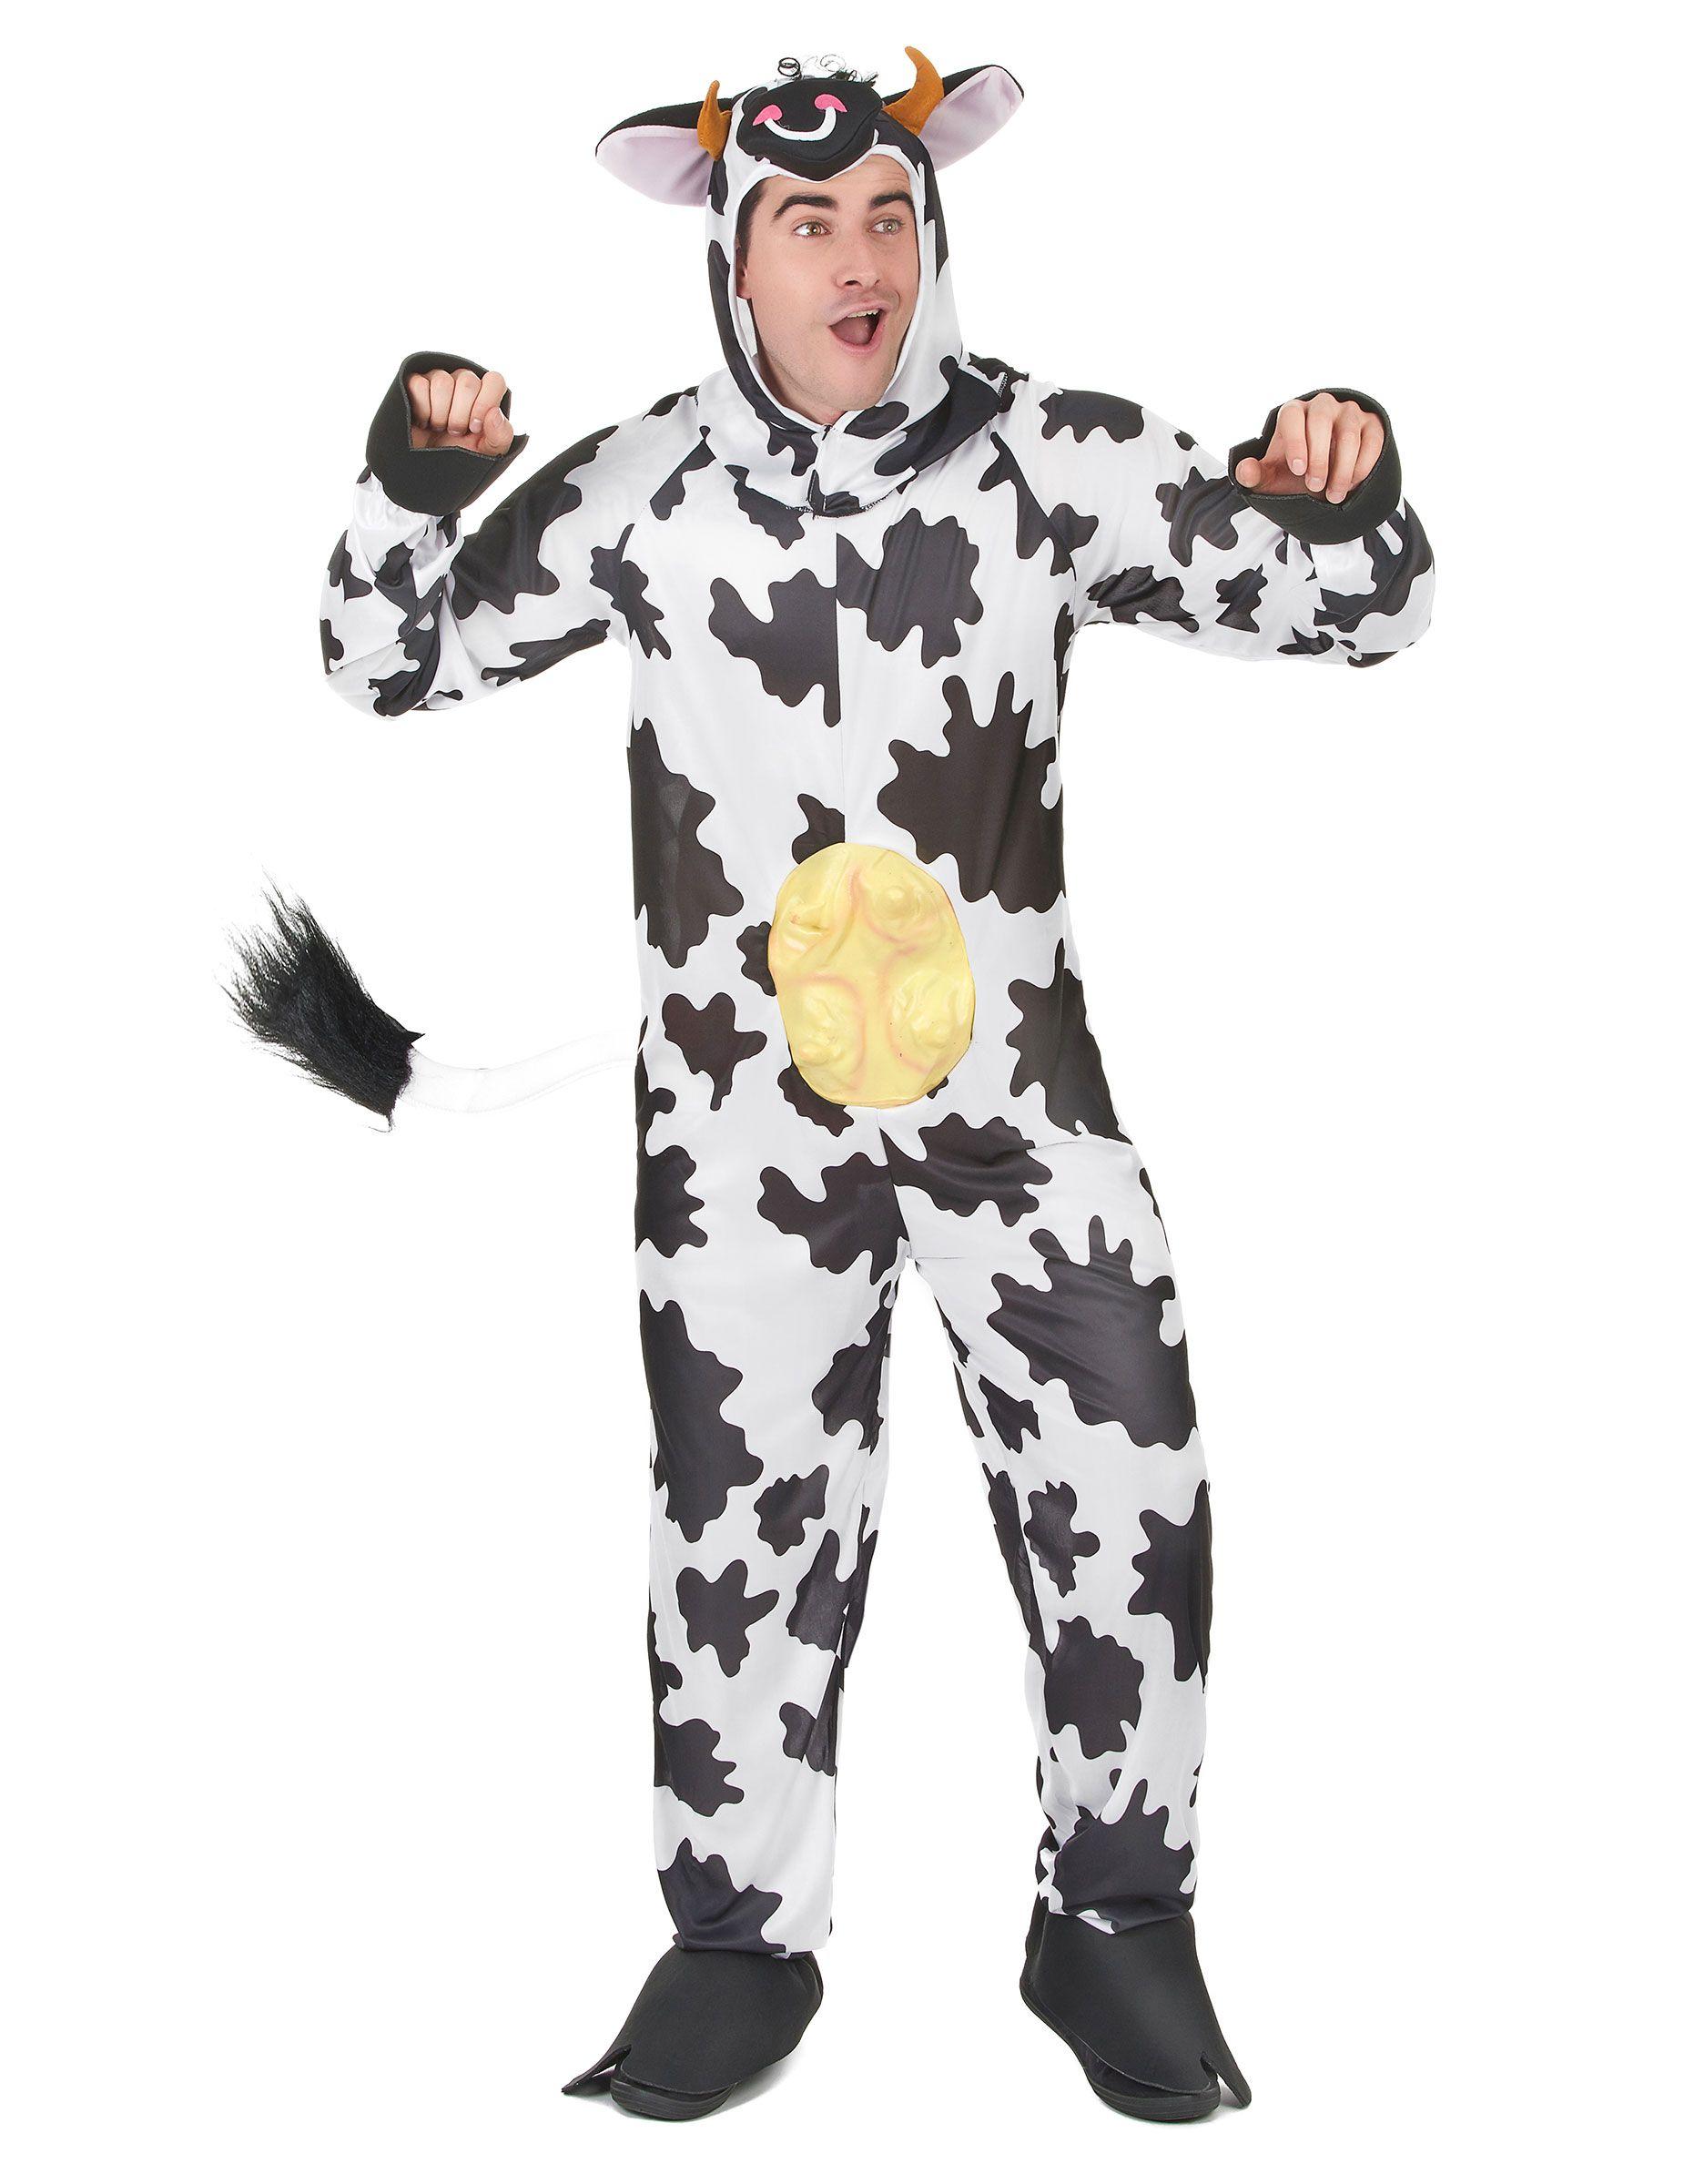 Cow Hat Black White Farm Animal Fancy Dress Up Halloween Adult Costume Accessory